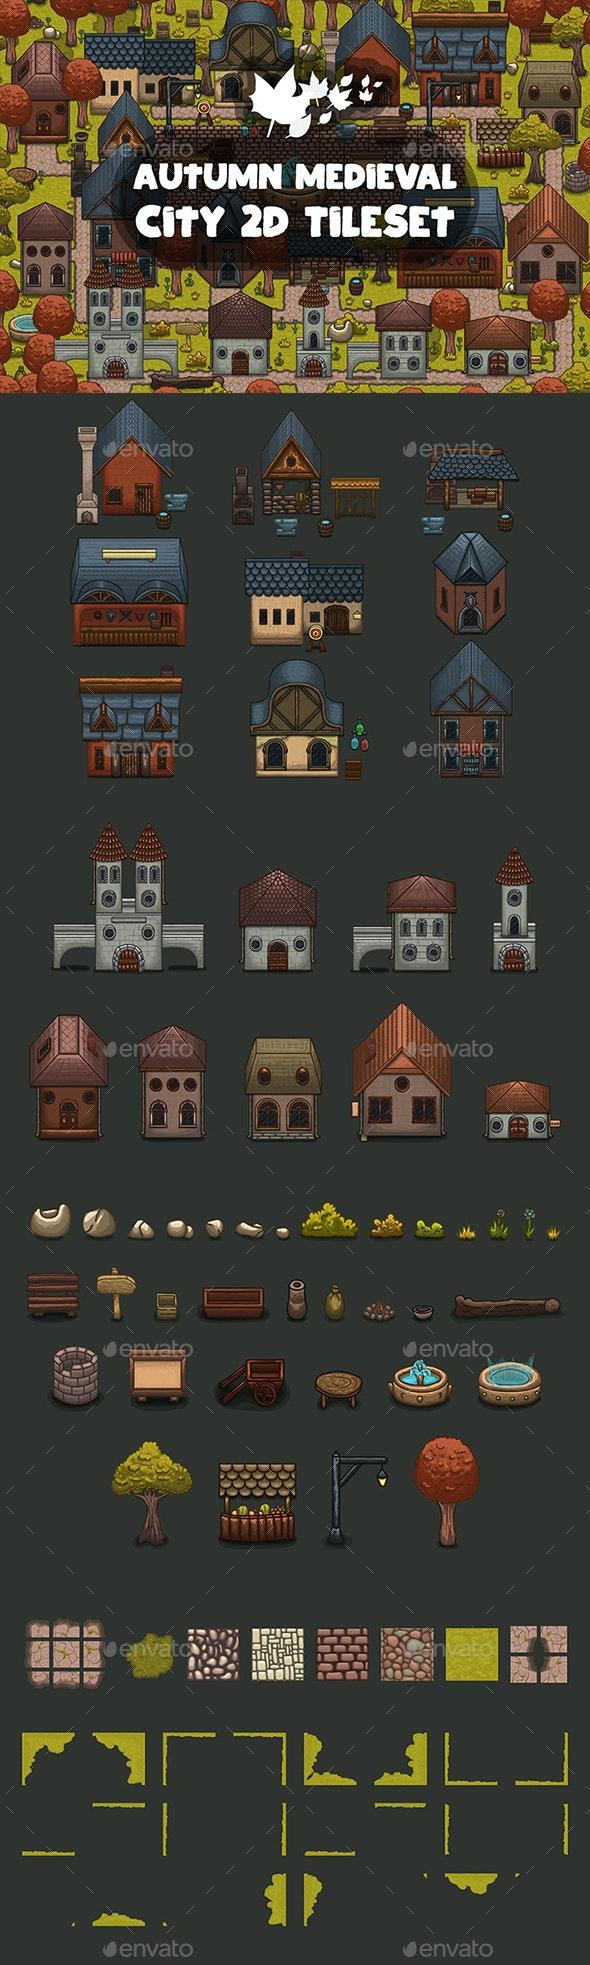 Autumn Medieval City Tile set - Tilesets Game Assets